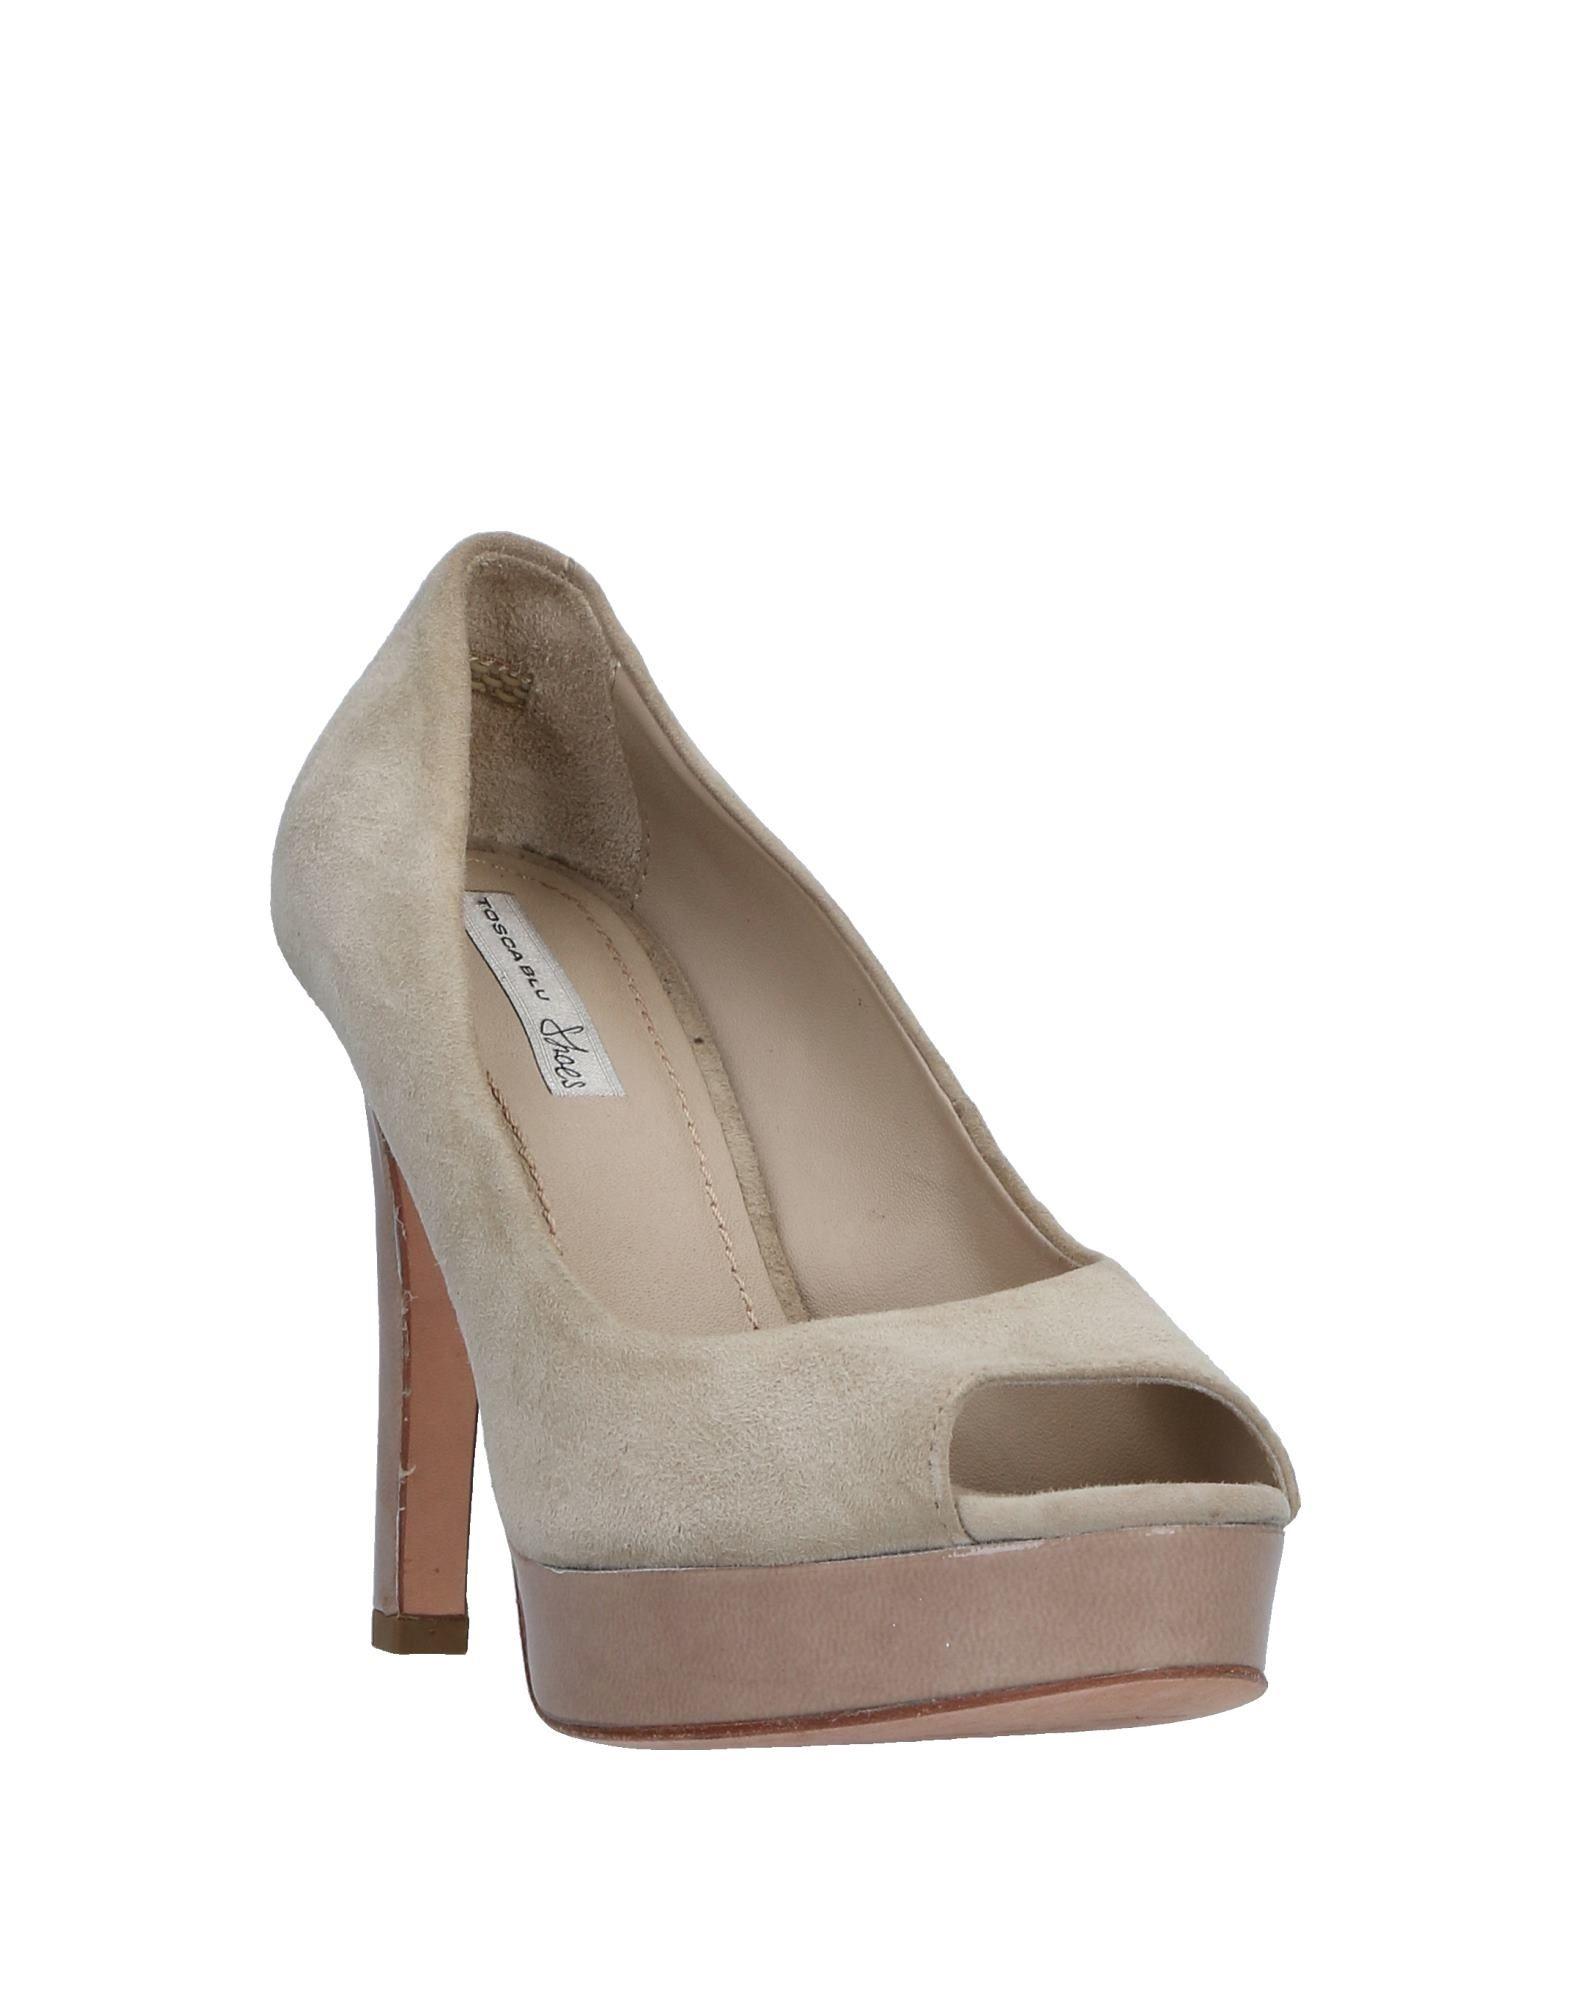 Tosca Blu Shoes Pumps Damen beliebte  11537758IN Gute Qualität beliebte Damen Schuhe 28521a